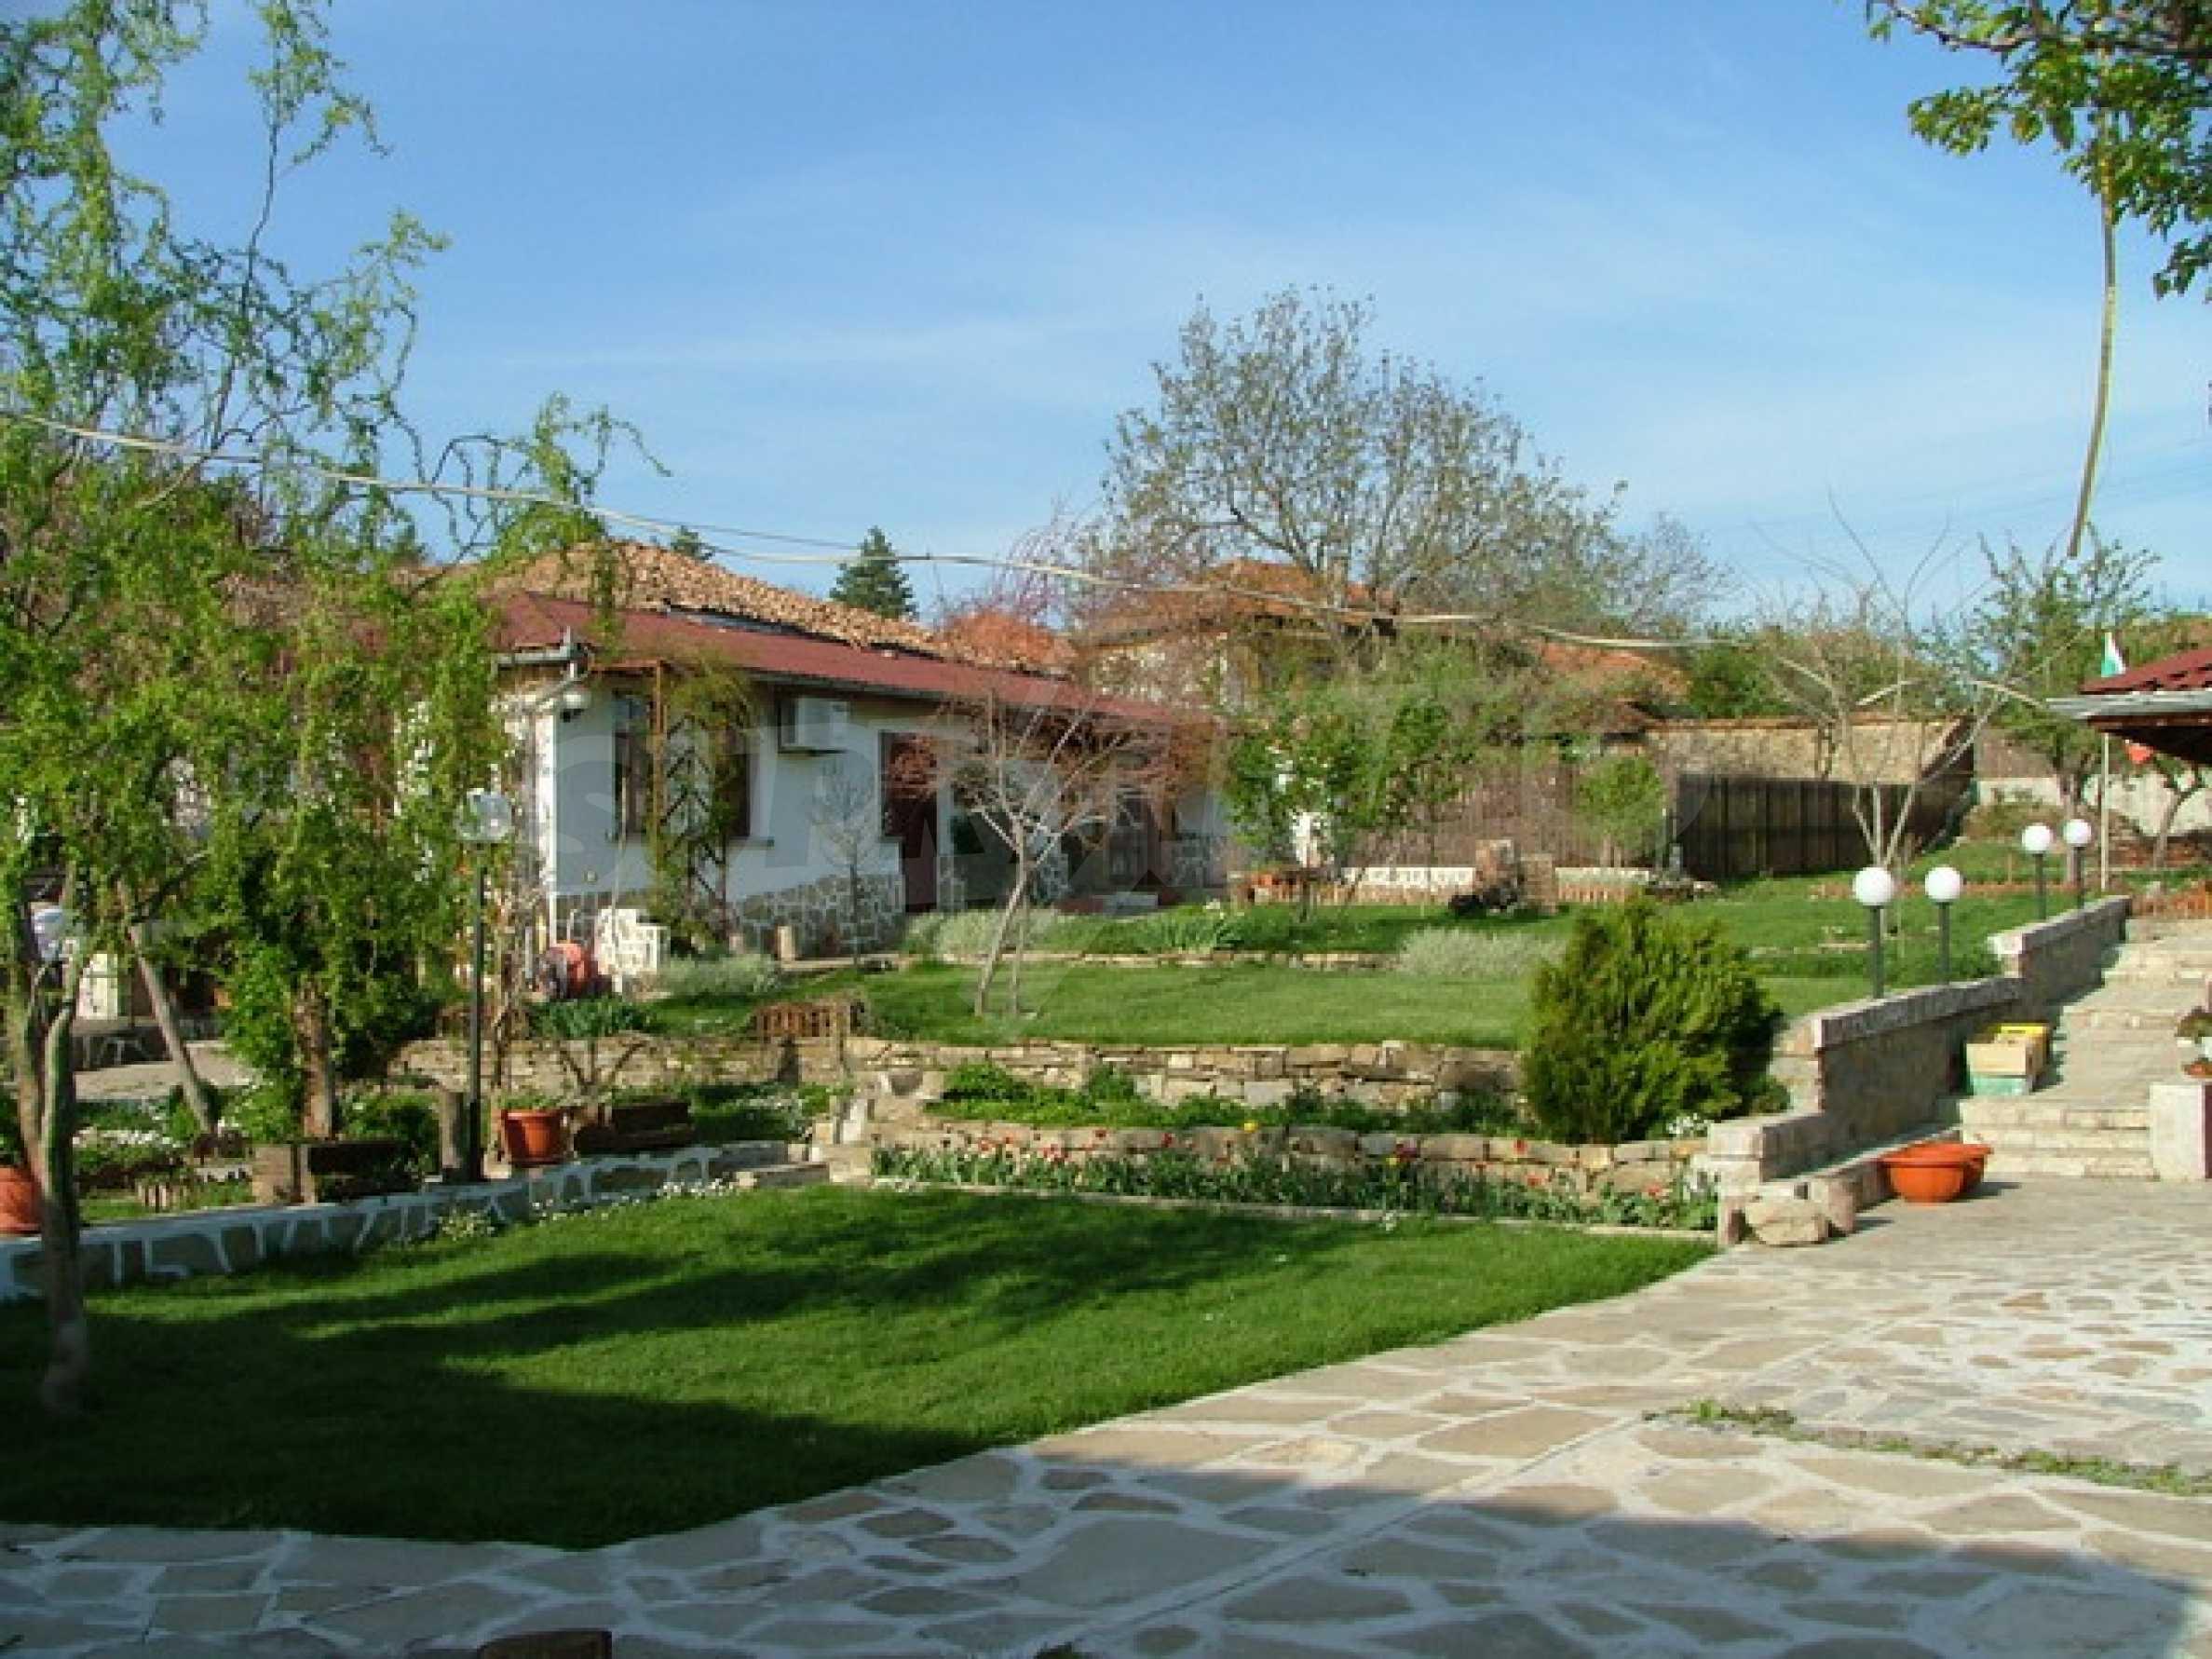 Stilvoll renovierte Villa 12 km entfernt. von Veliko Tarnovo 21